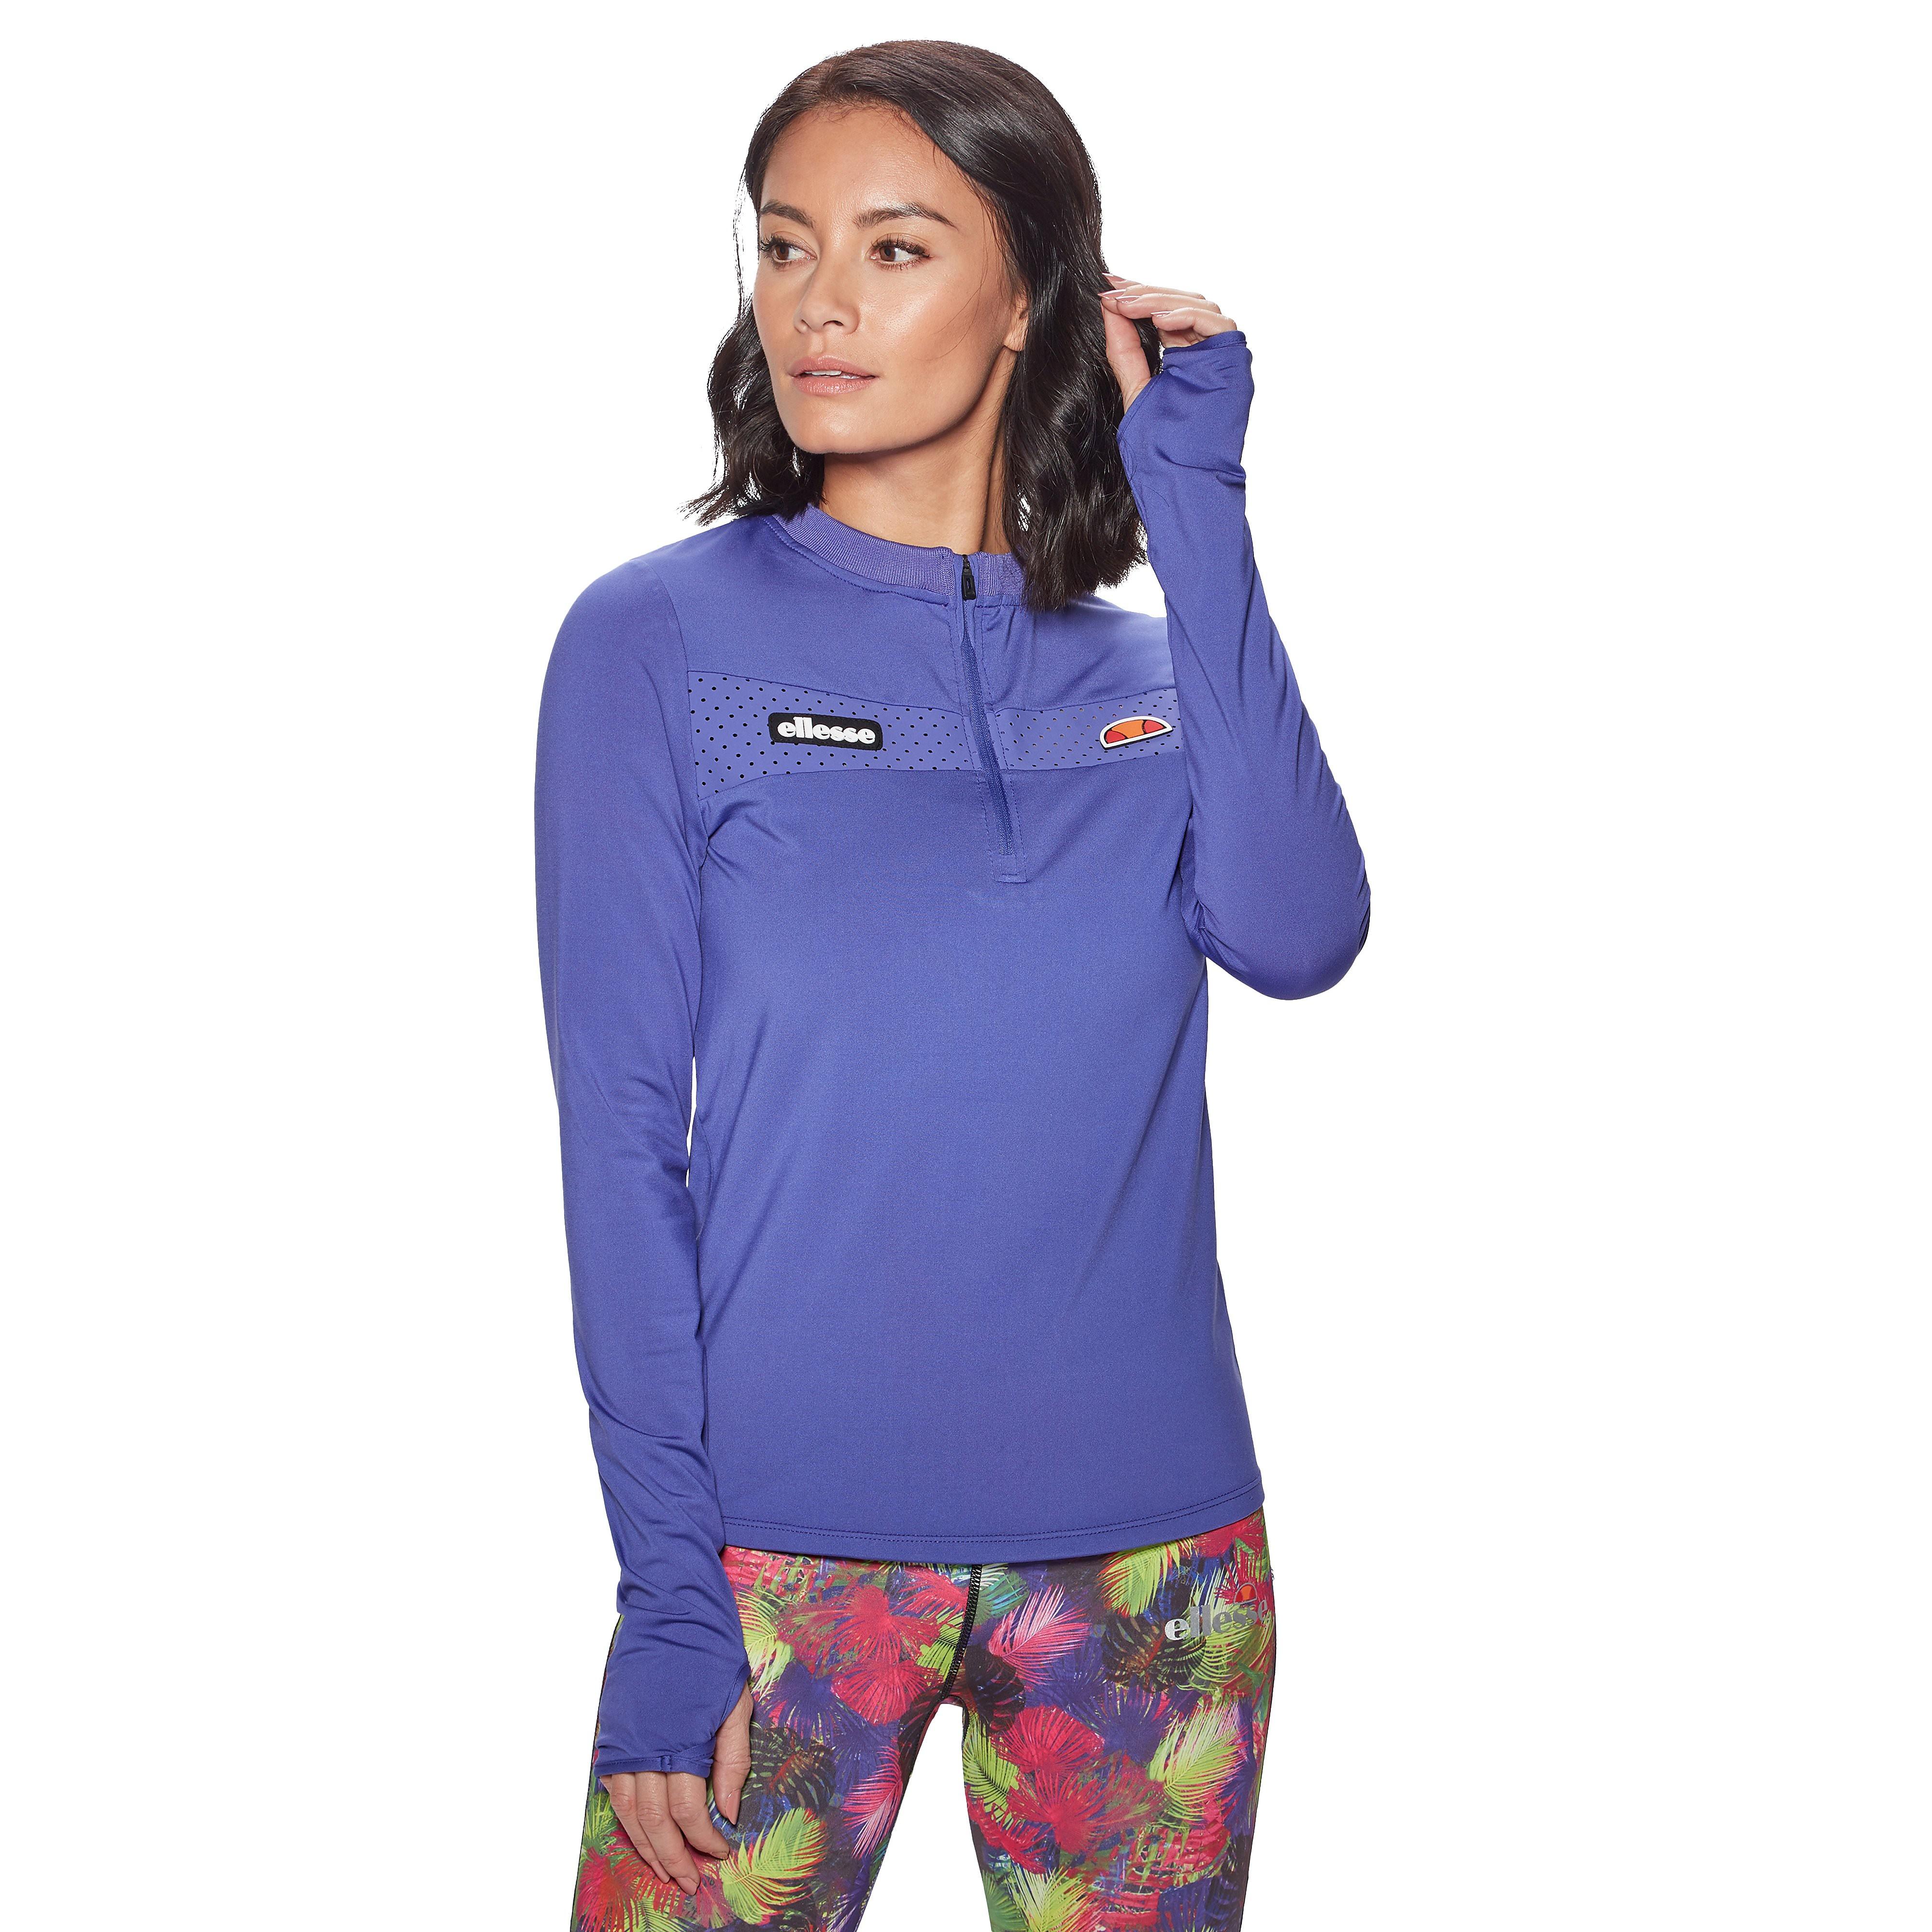 Ellesse HESTIA ½ Zip Long Sleeve Women's Training Top